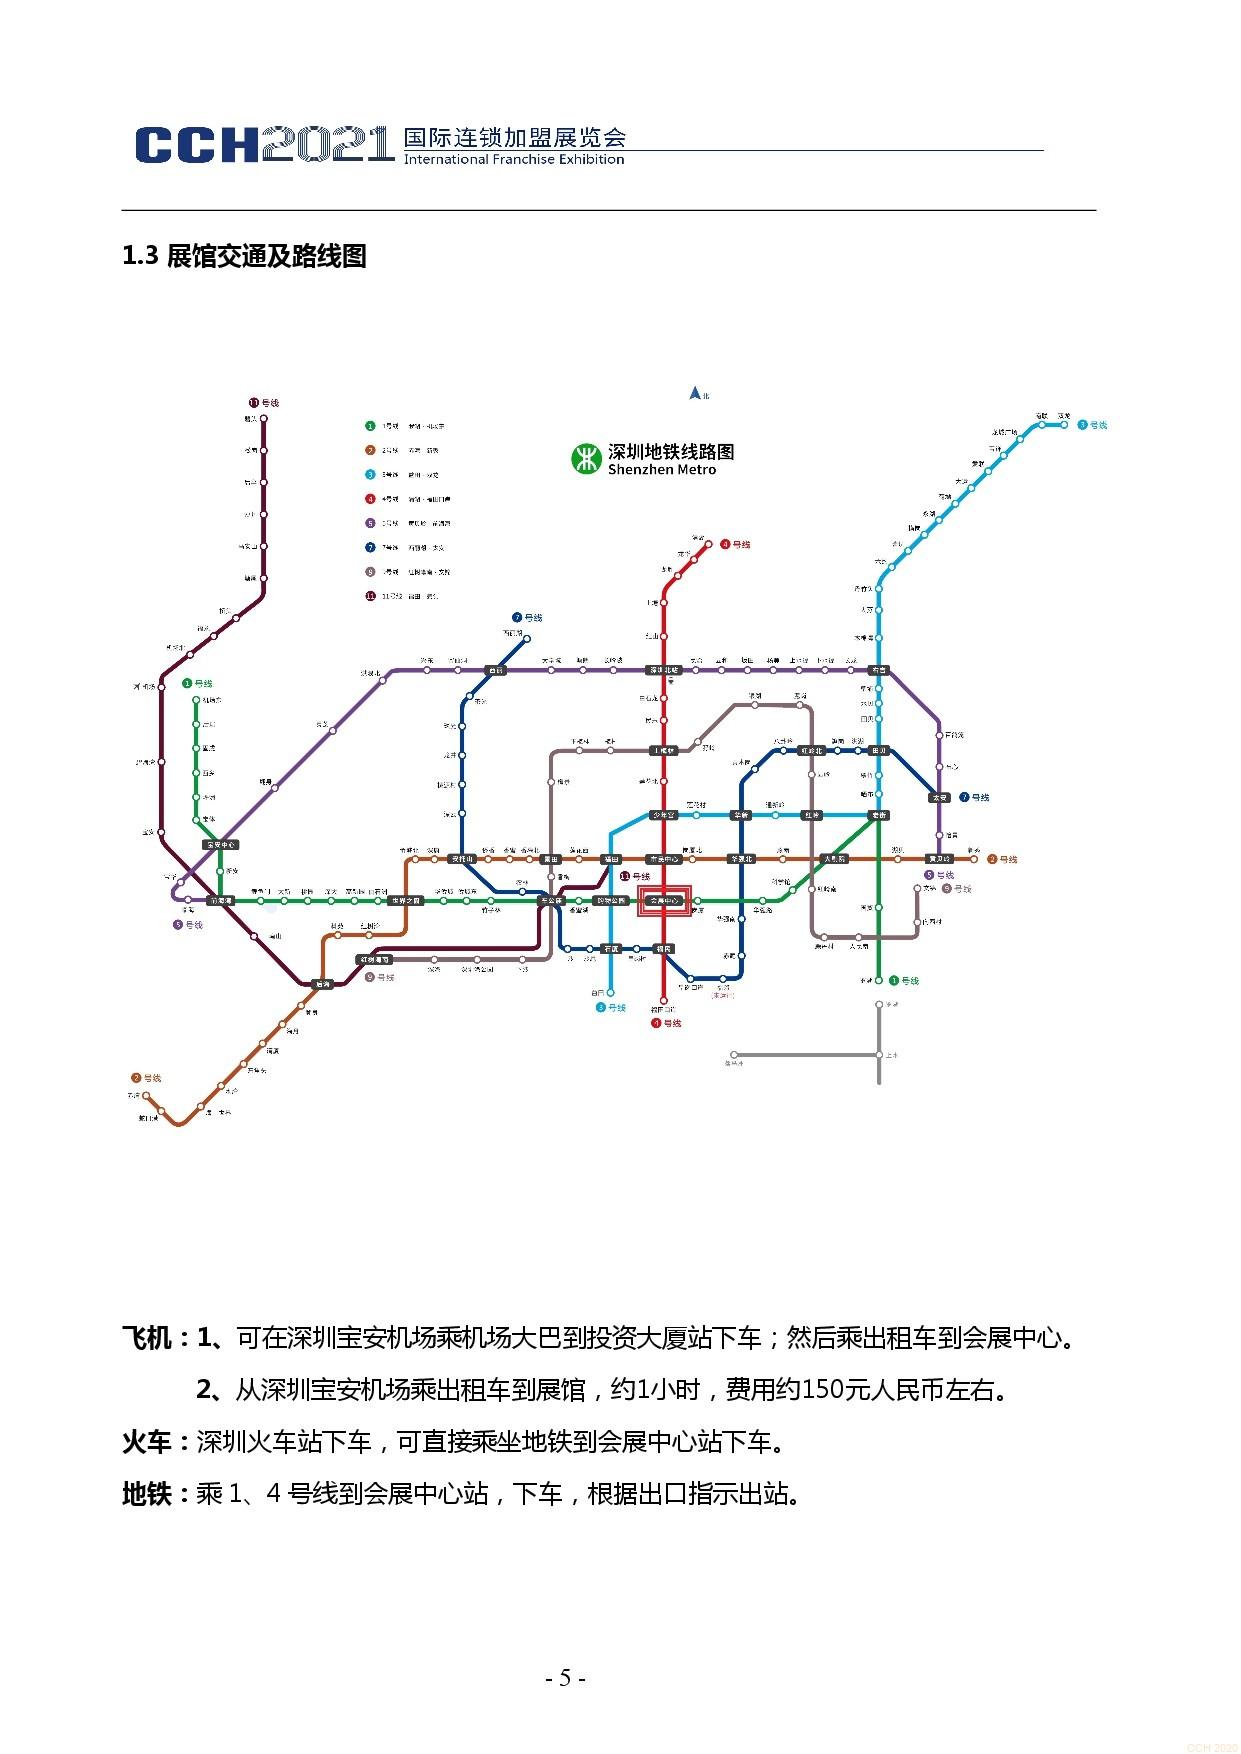 0416CCH深圳展参展商手册4.16-005.jpg